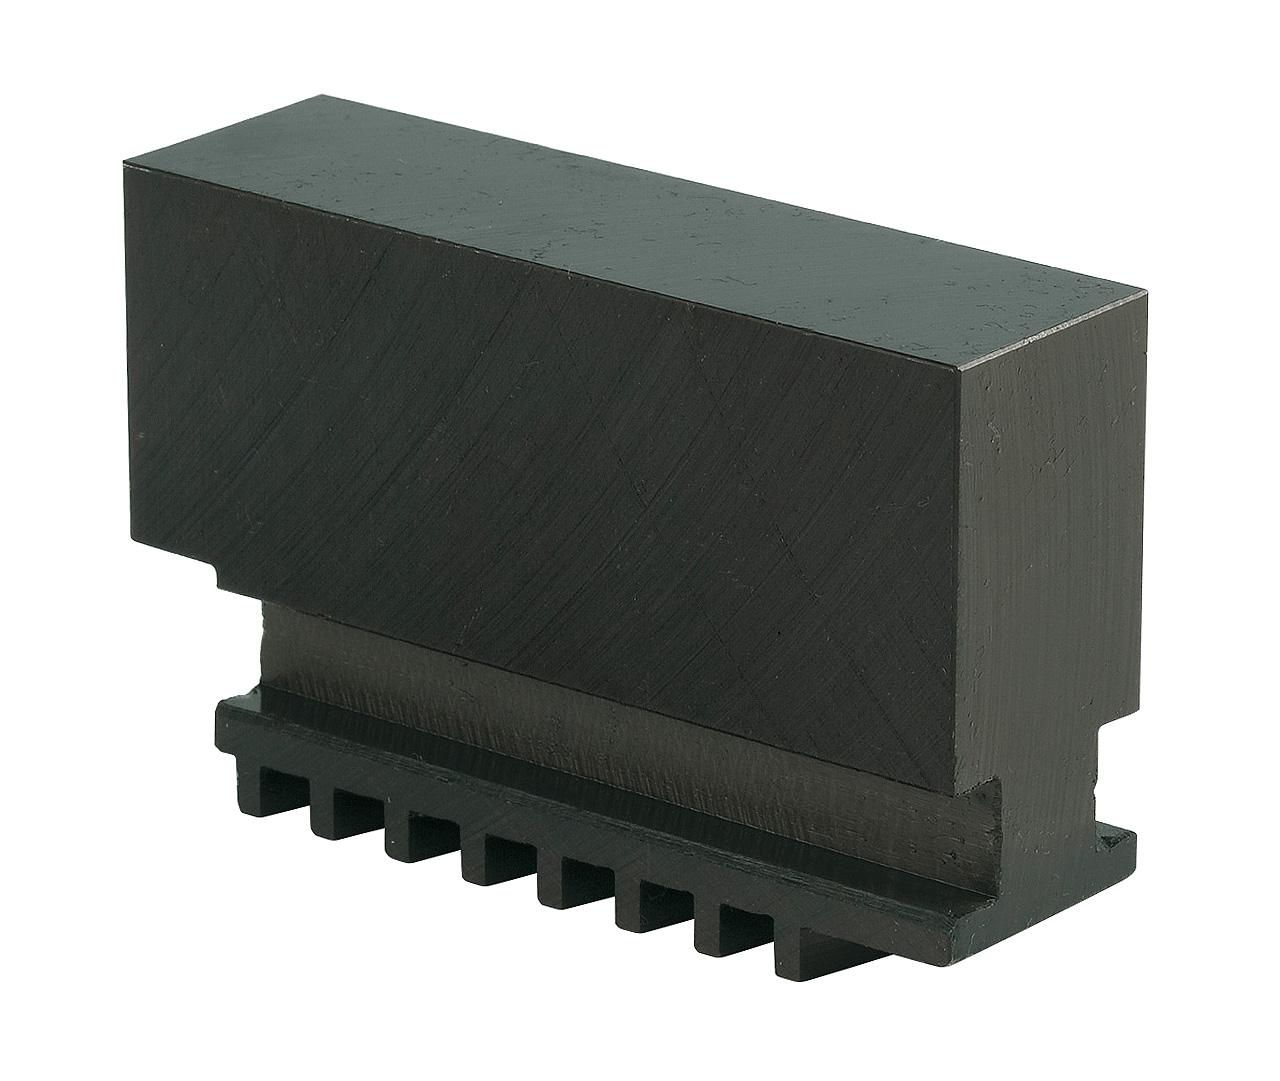 Szczęki jednolite miękkie - komplet SJ-PS4-200 BERNARDO